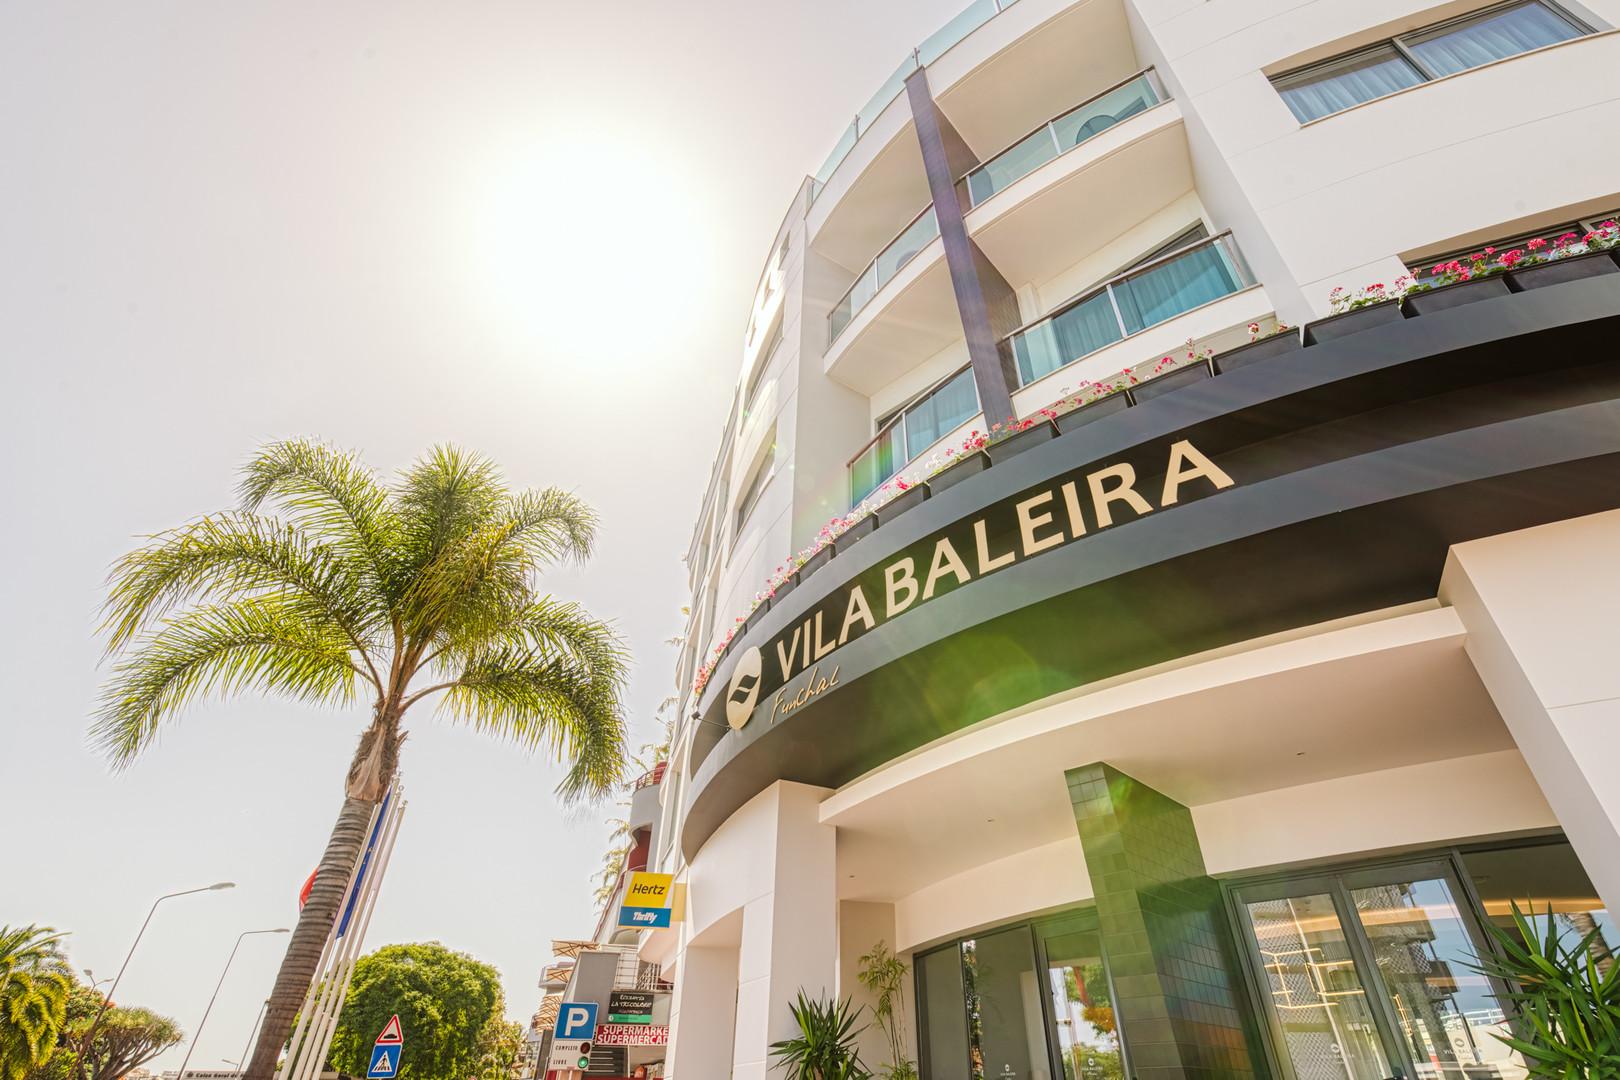 Hotel Vila Baleira Funchal #2